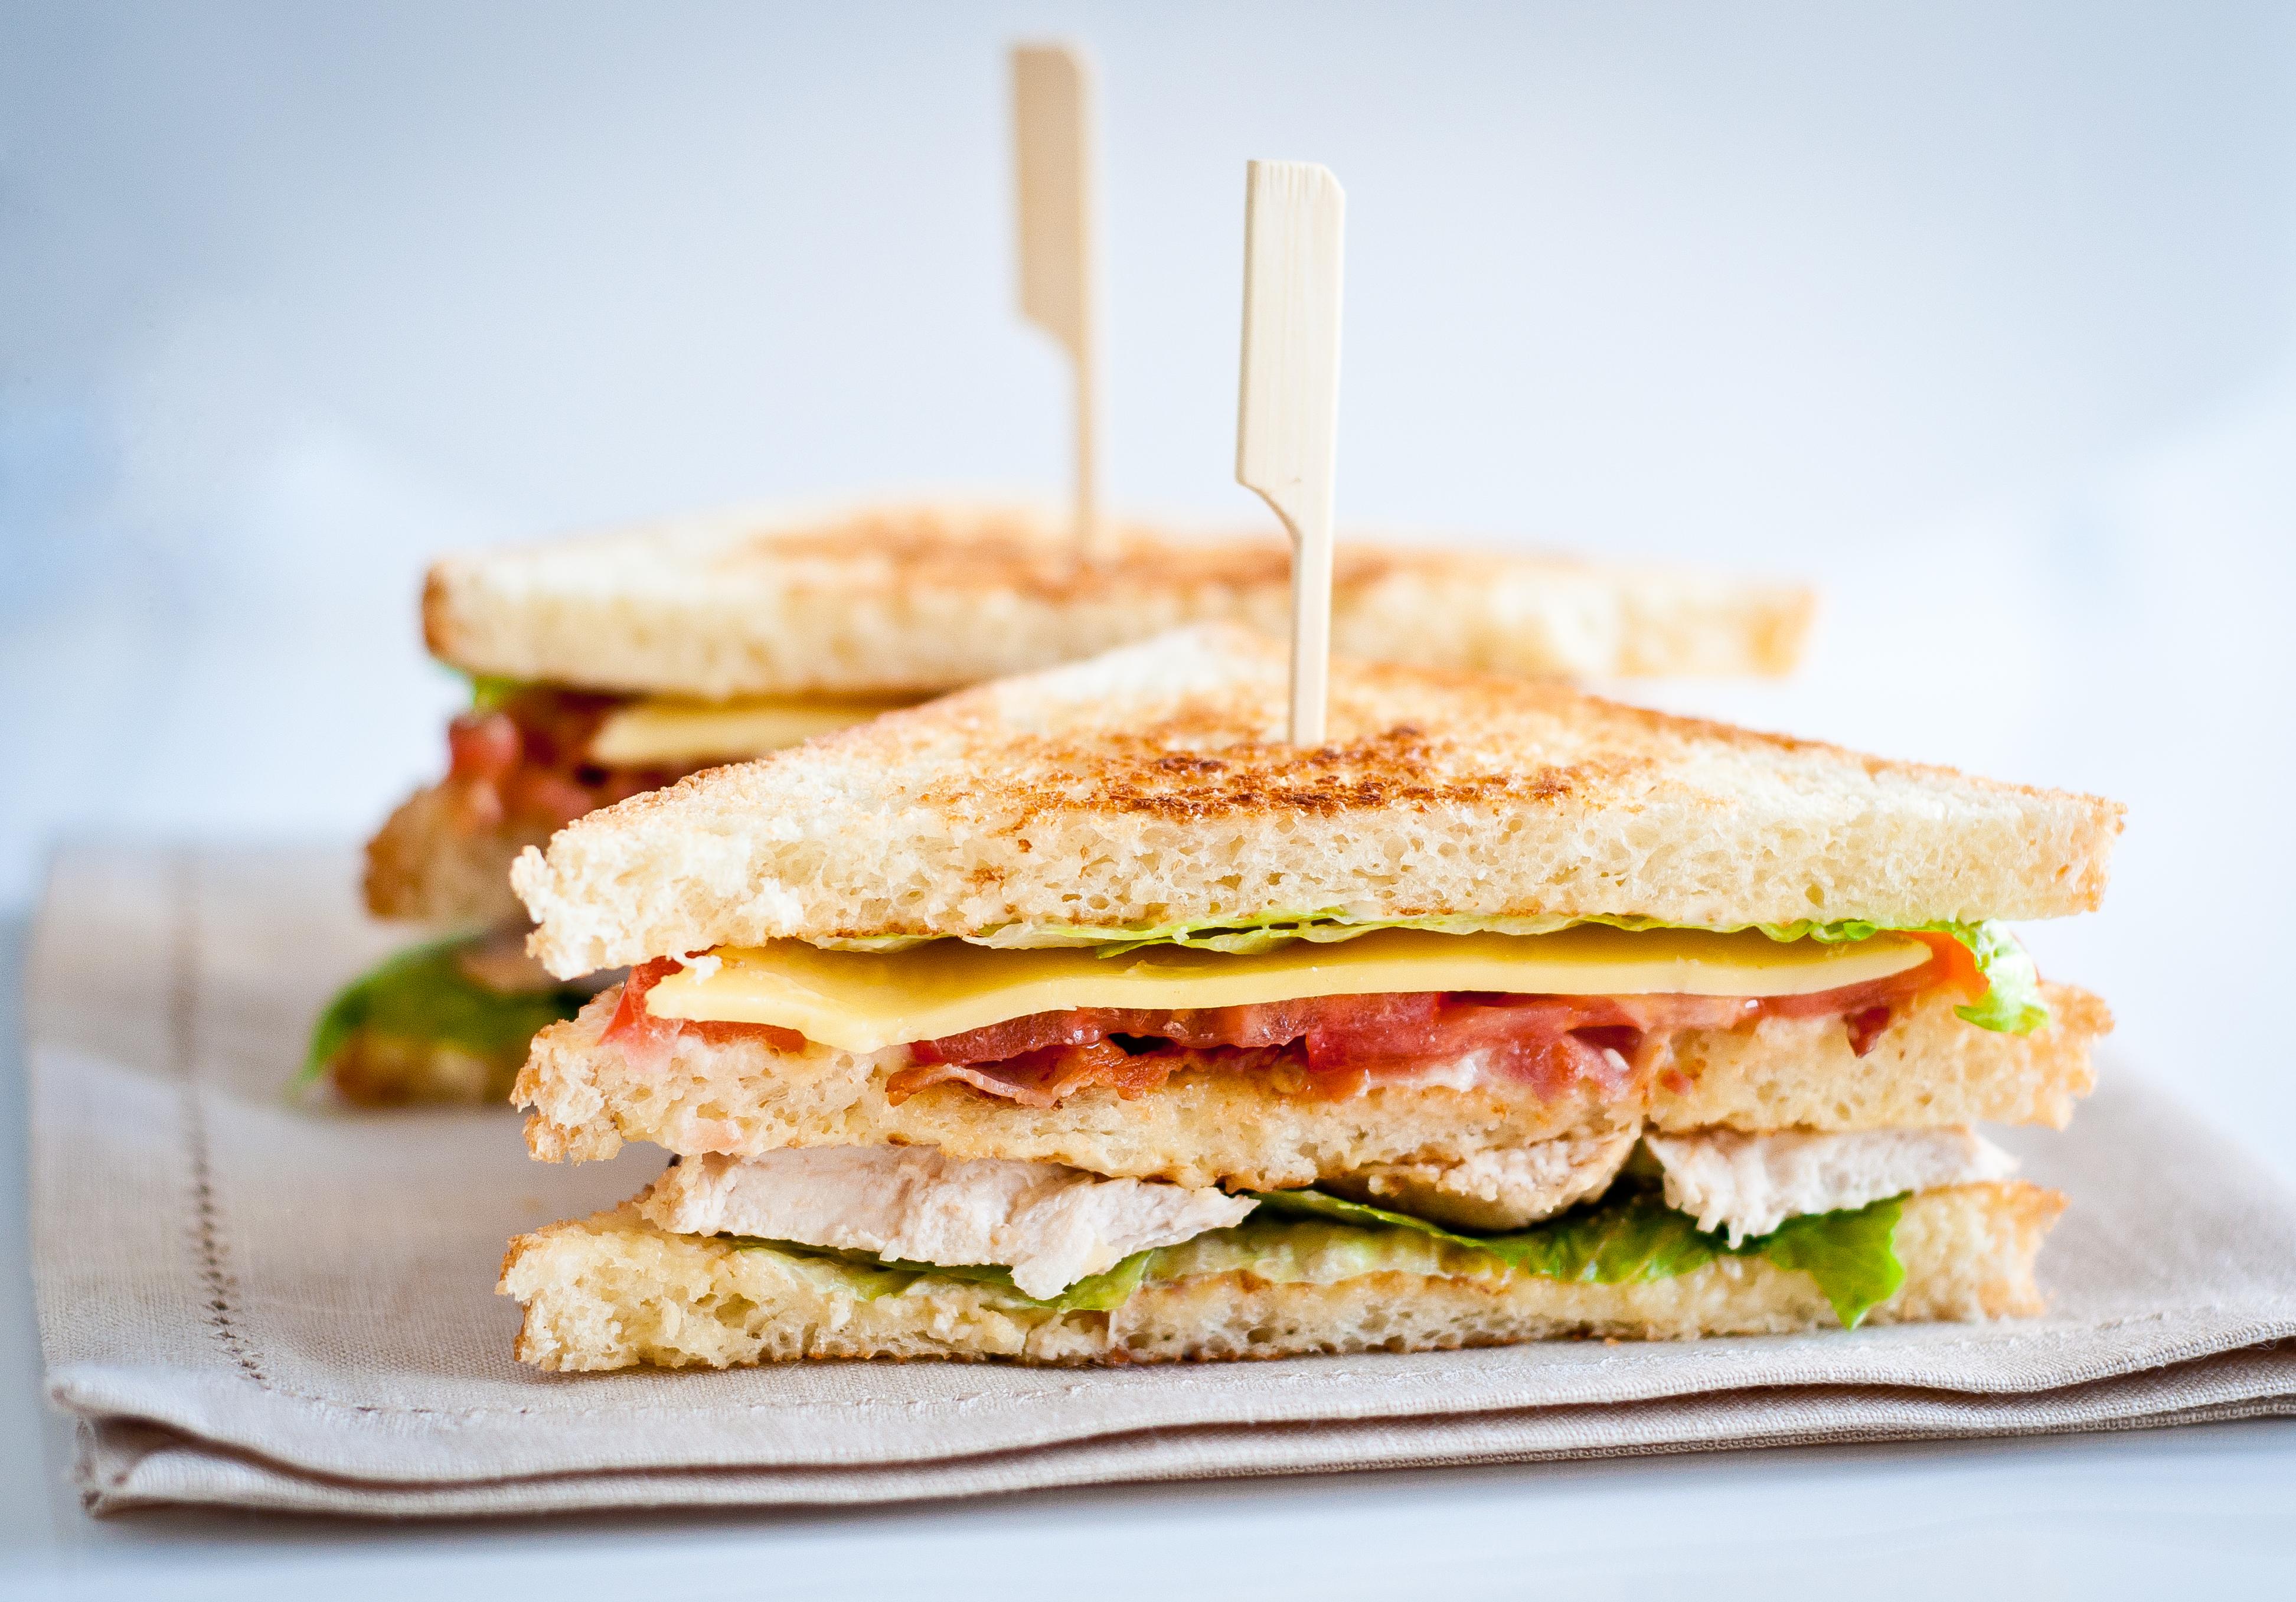 Клаб сэндвич с курицей рецепт с фото пошагово